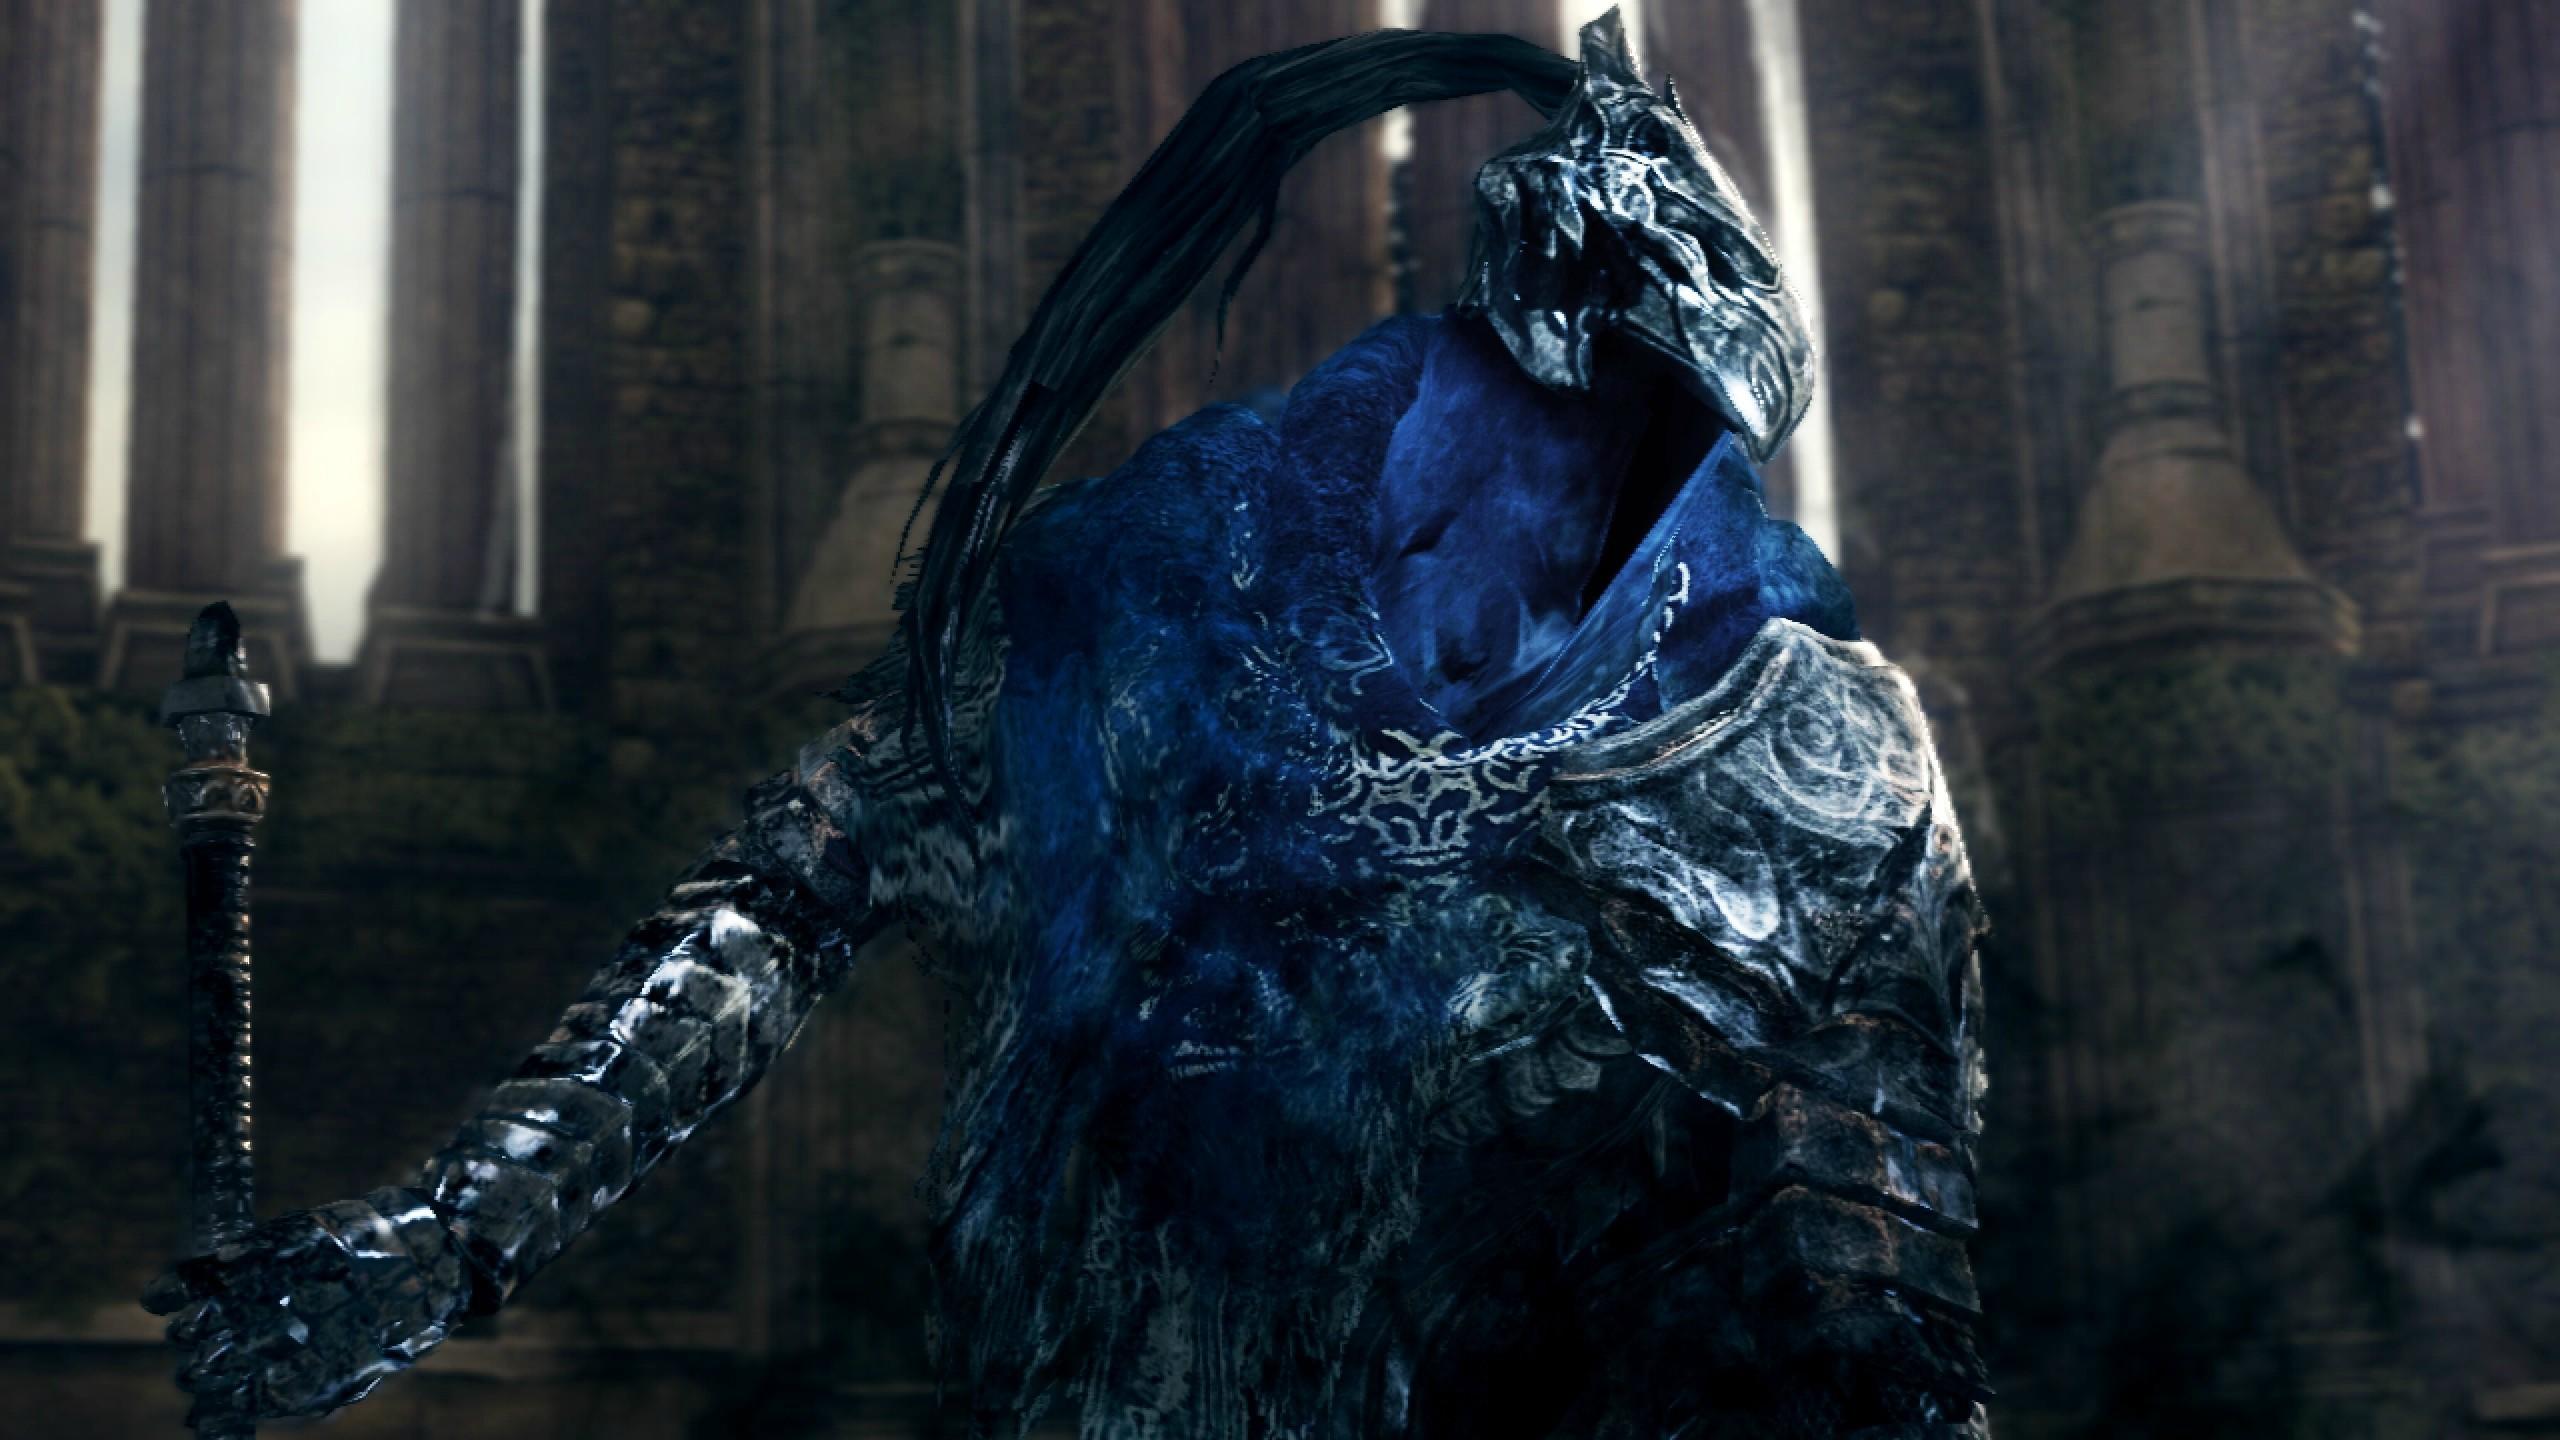 Dark Souls Video Game Images